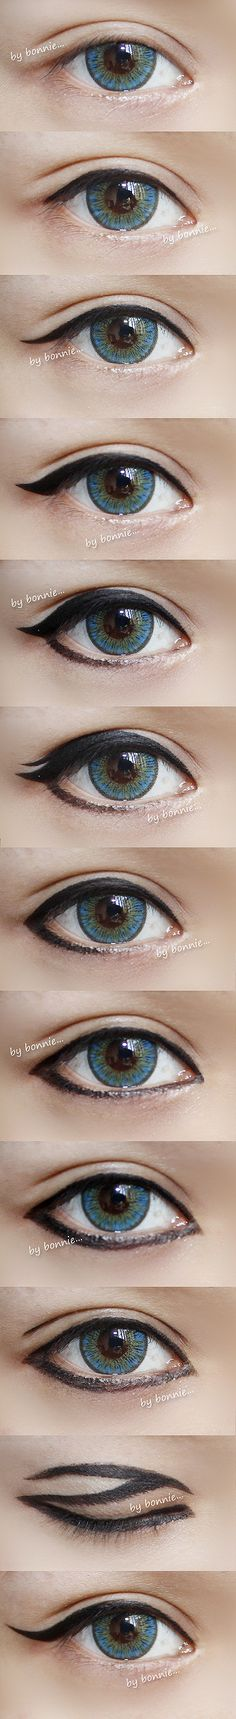 Different types of eyeliner #eyes